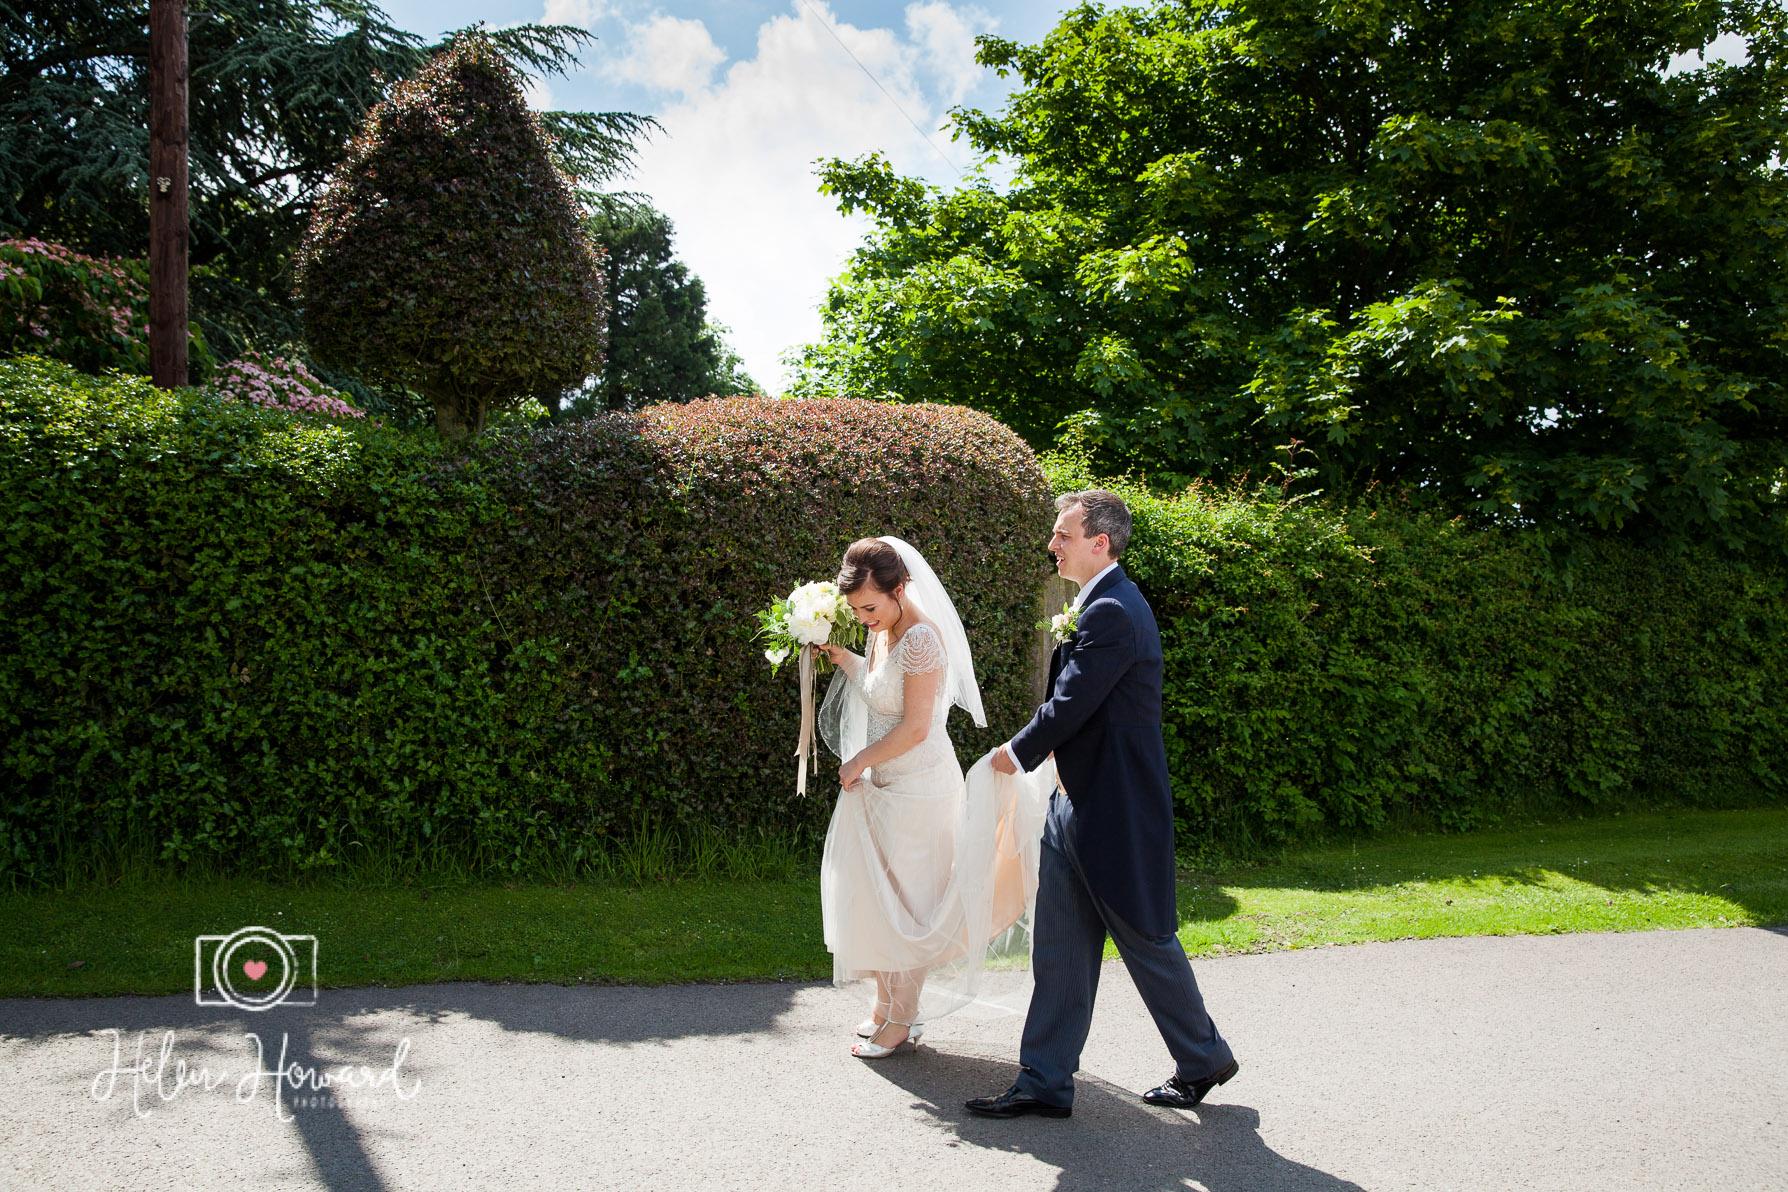 Helen Howard Photography Packington Moor Wedding-76.jpg